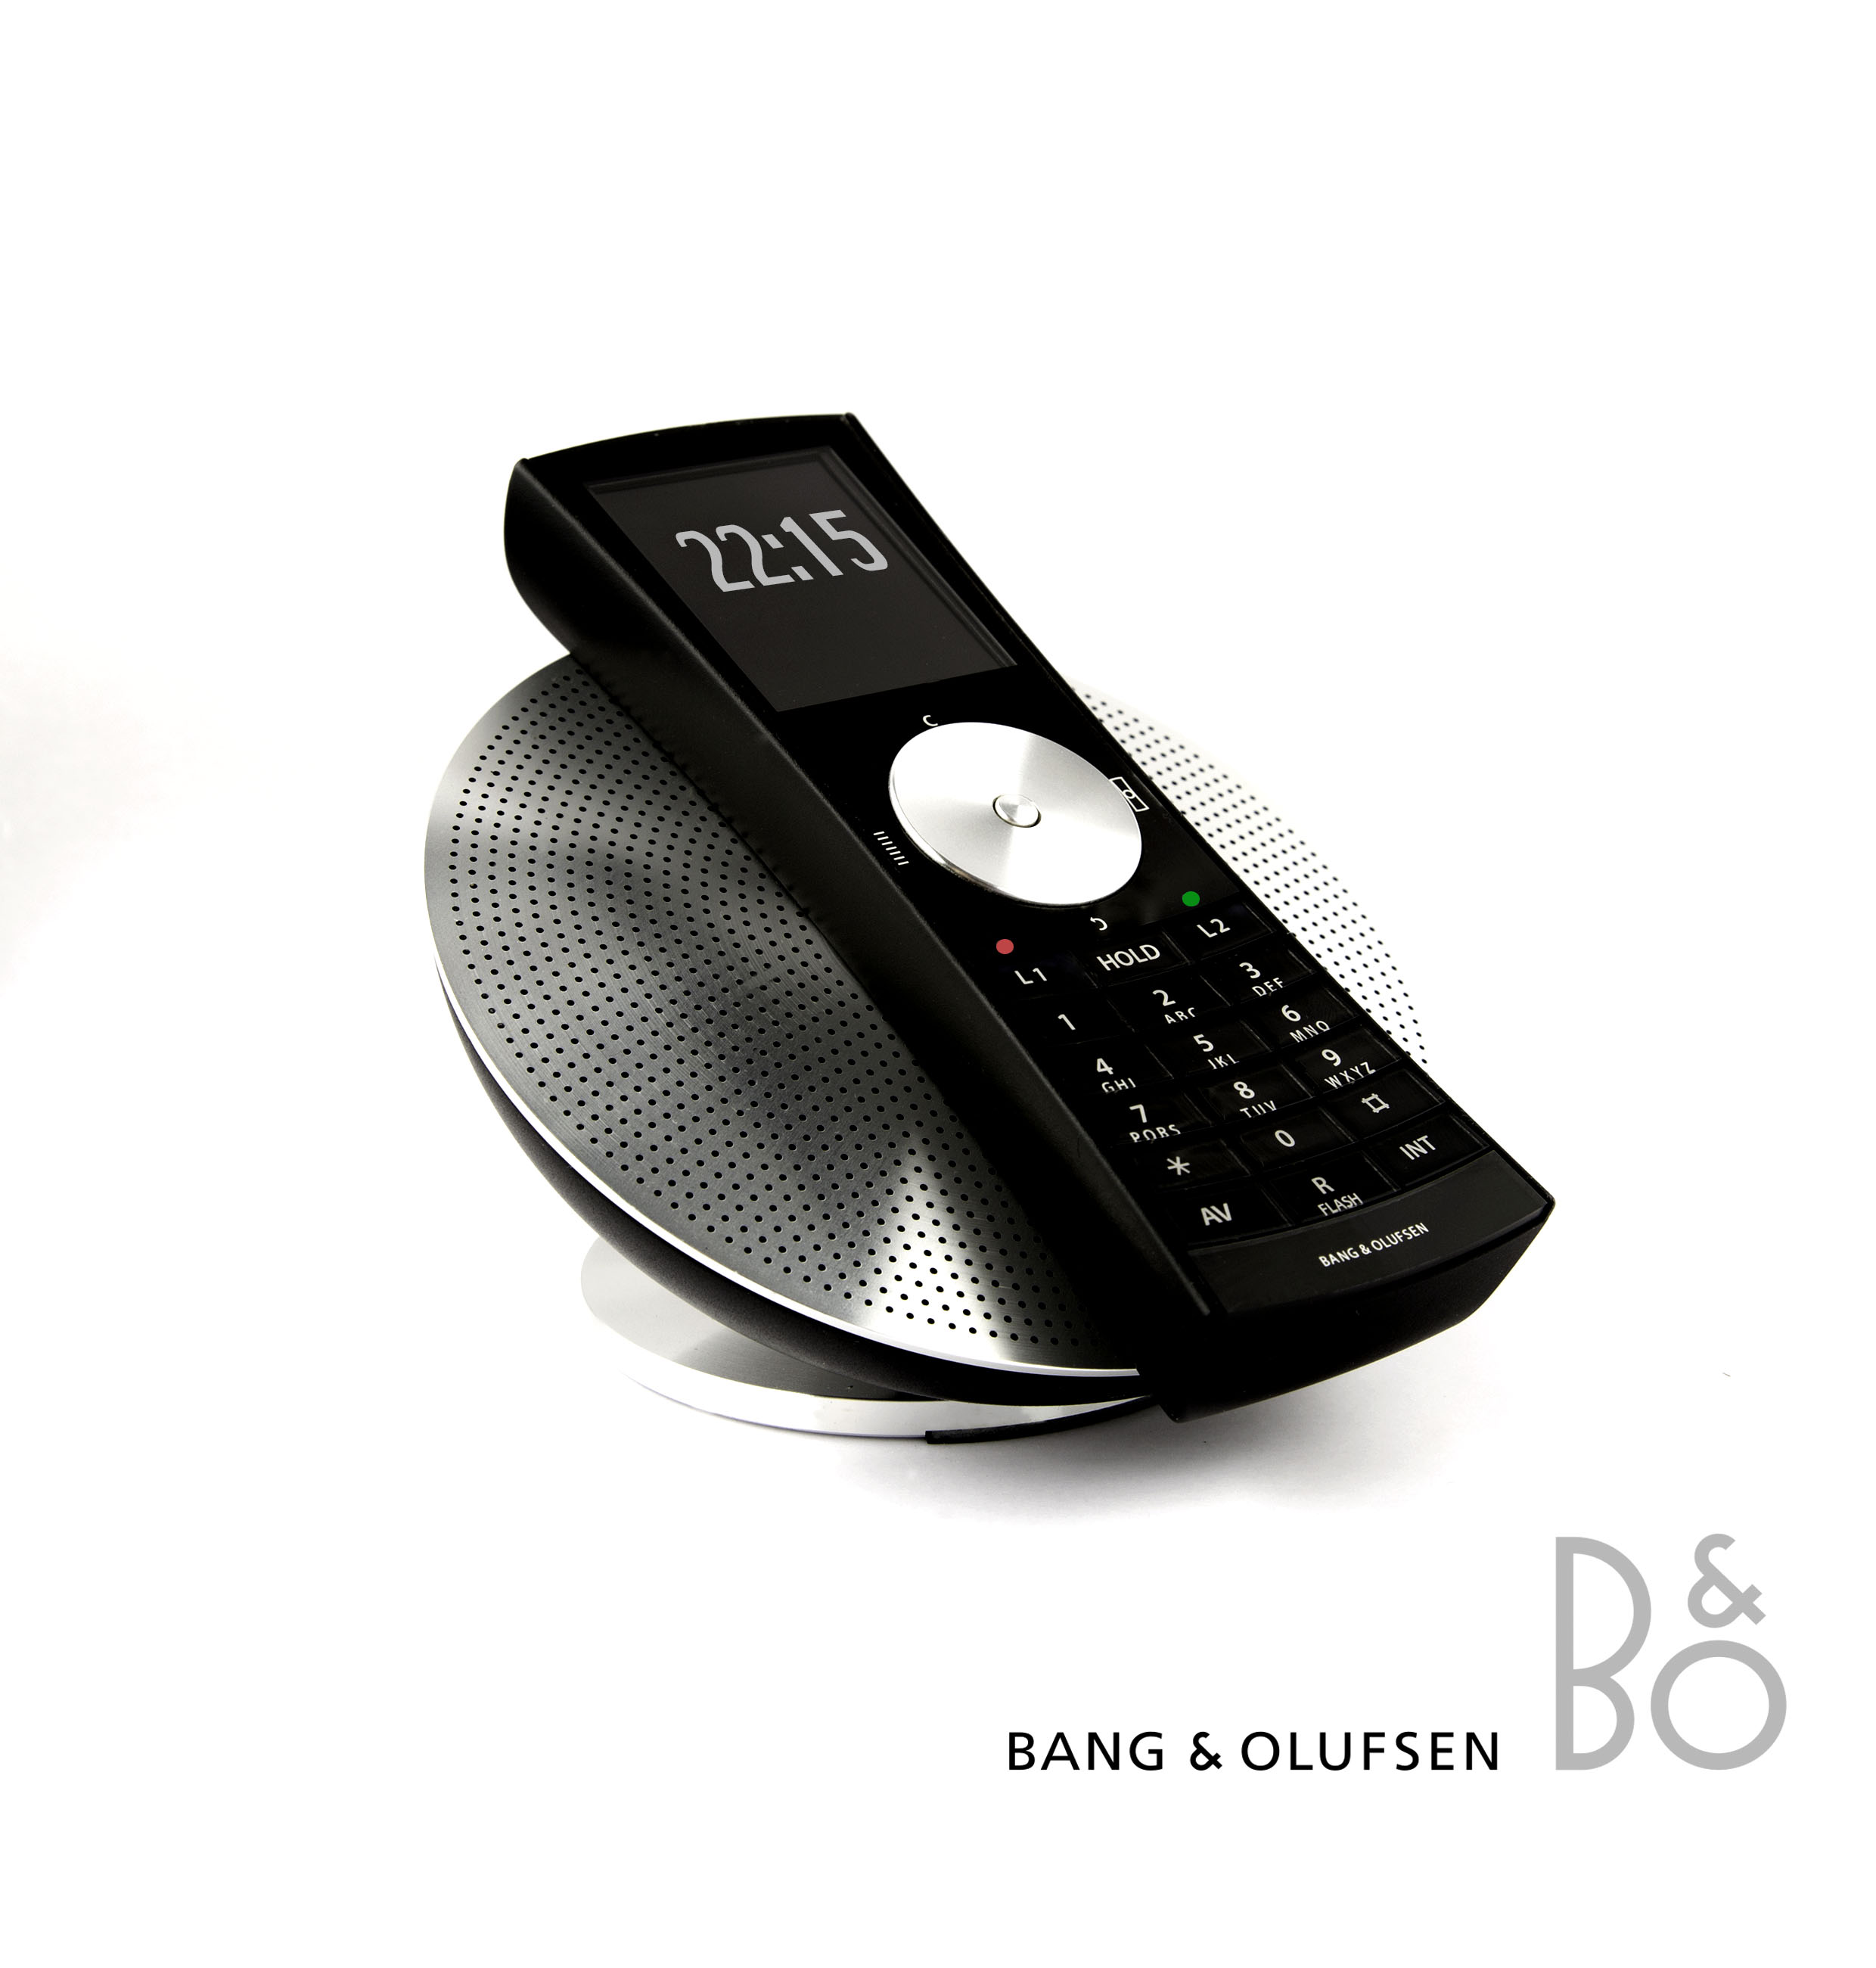 B&O 1